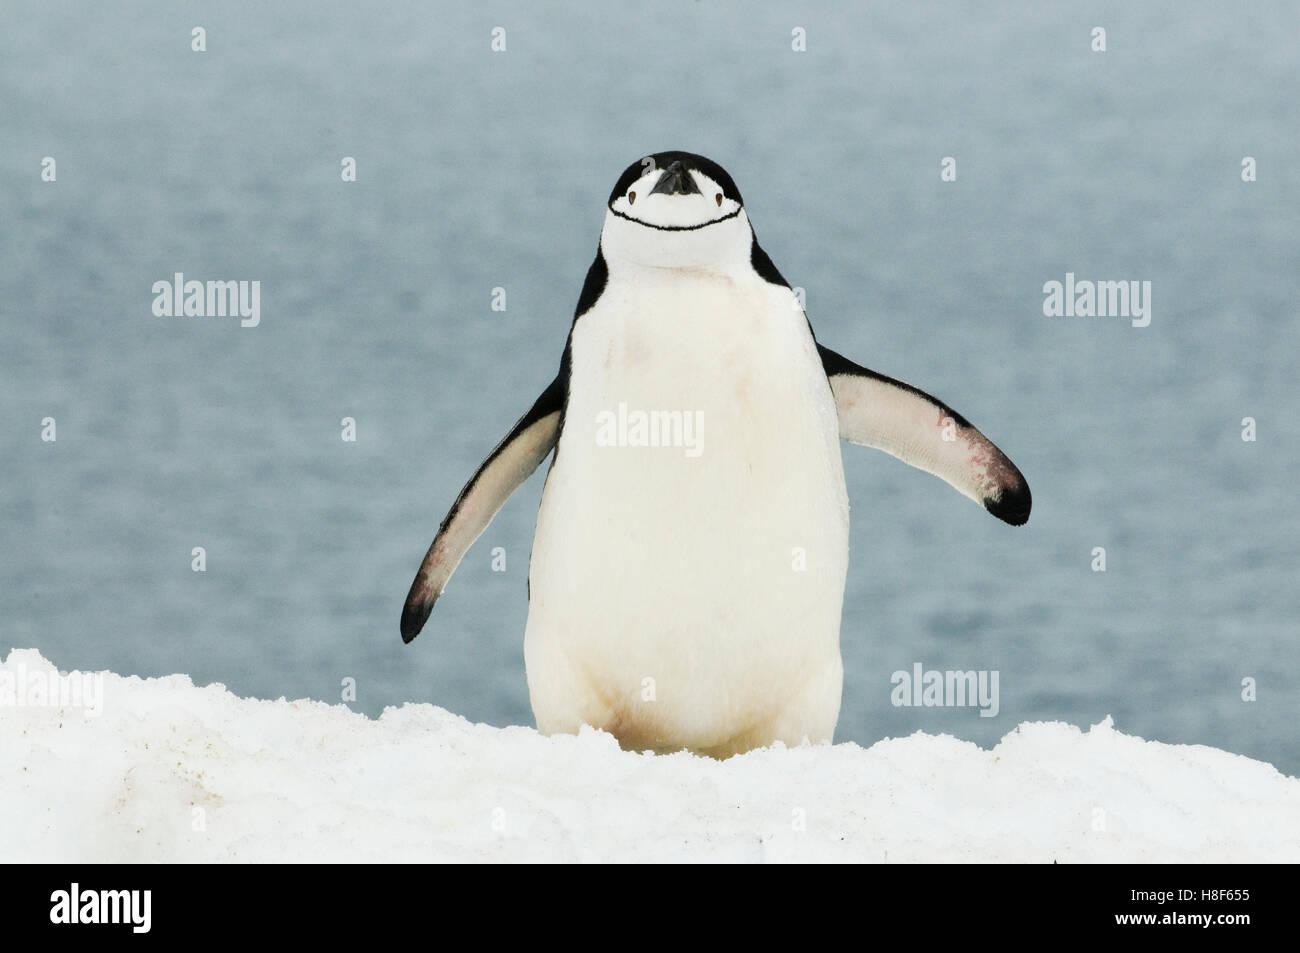 Zügelpinguinen (Pygoscelis Antarctica) Penguin antarktische Halbinsel, Antarktis Stockbild